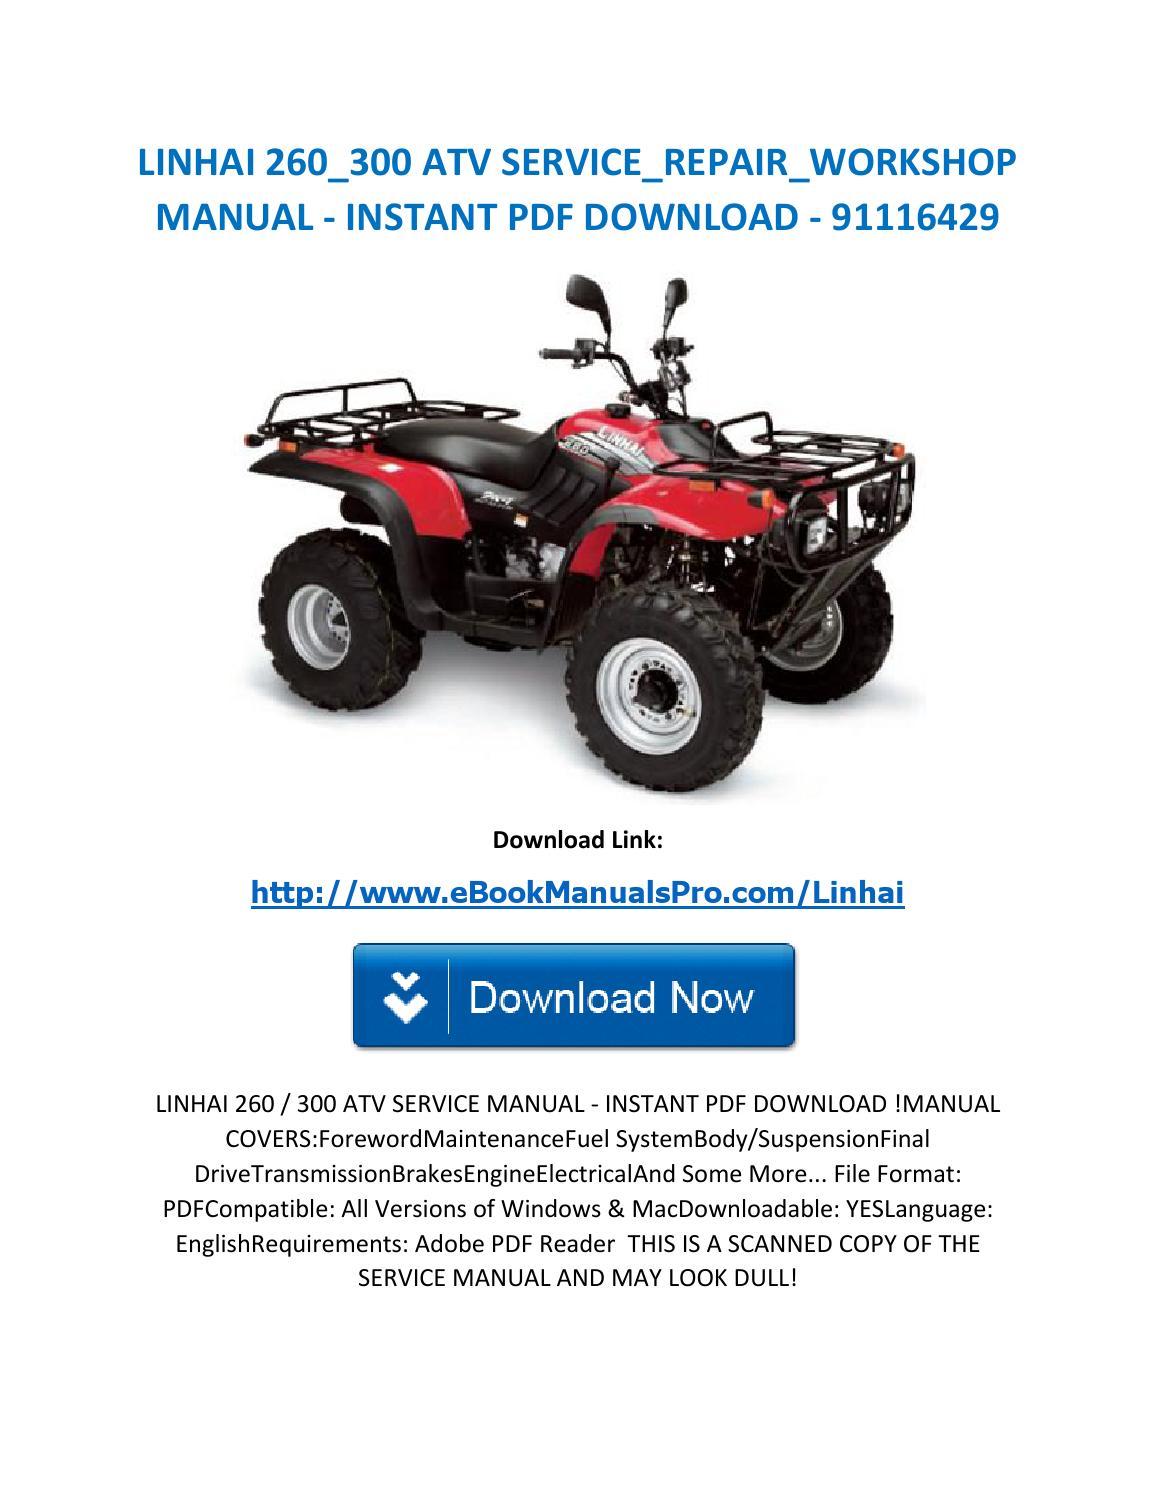 Linhai 260 300 atv service repair workshop manual instant pdf download  91116429 by karl casino - issuu